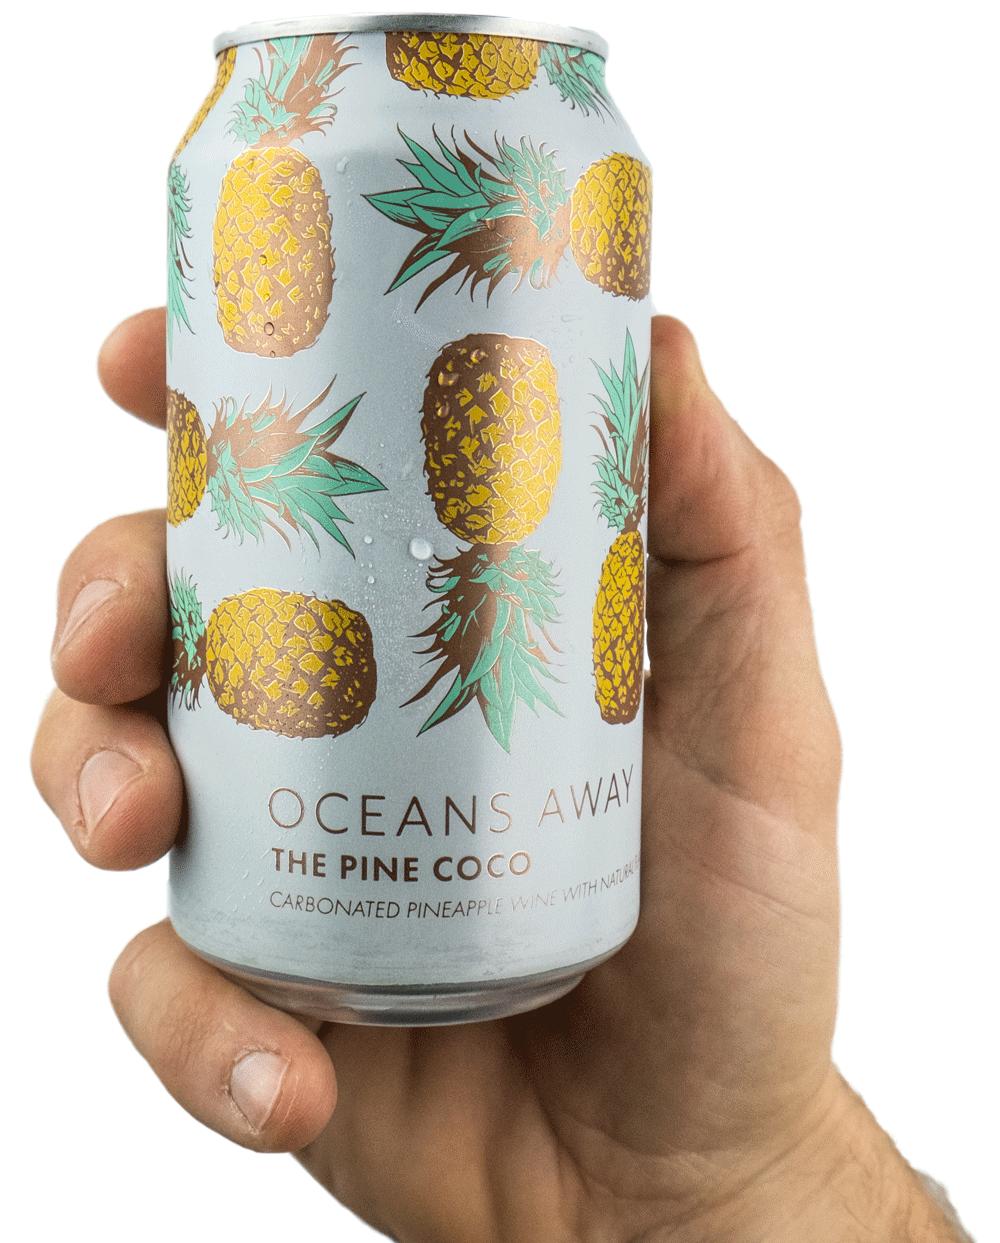 Oceans-Away-Pine-Coco-Caninhand